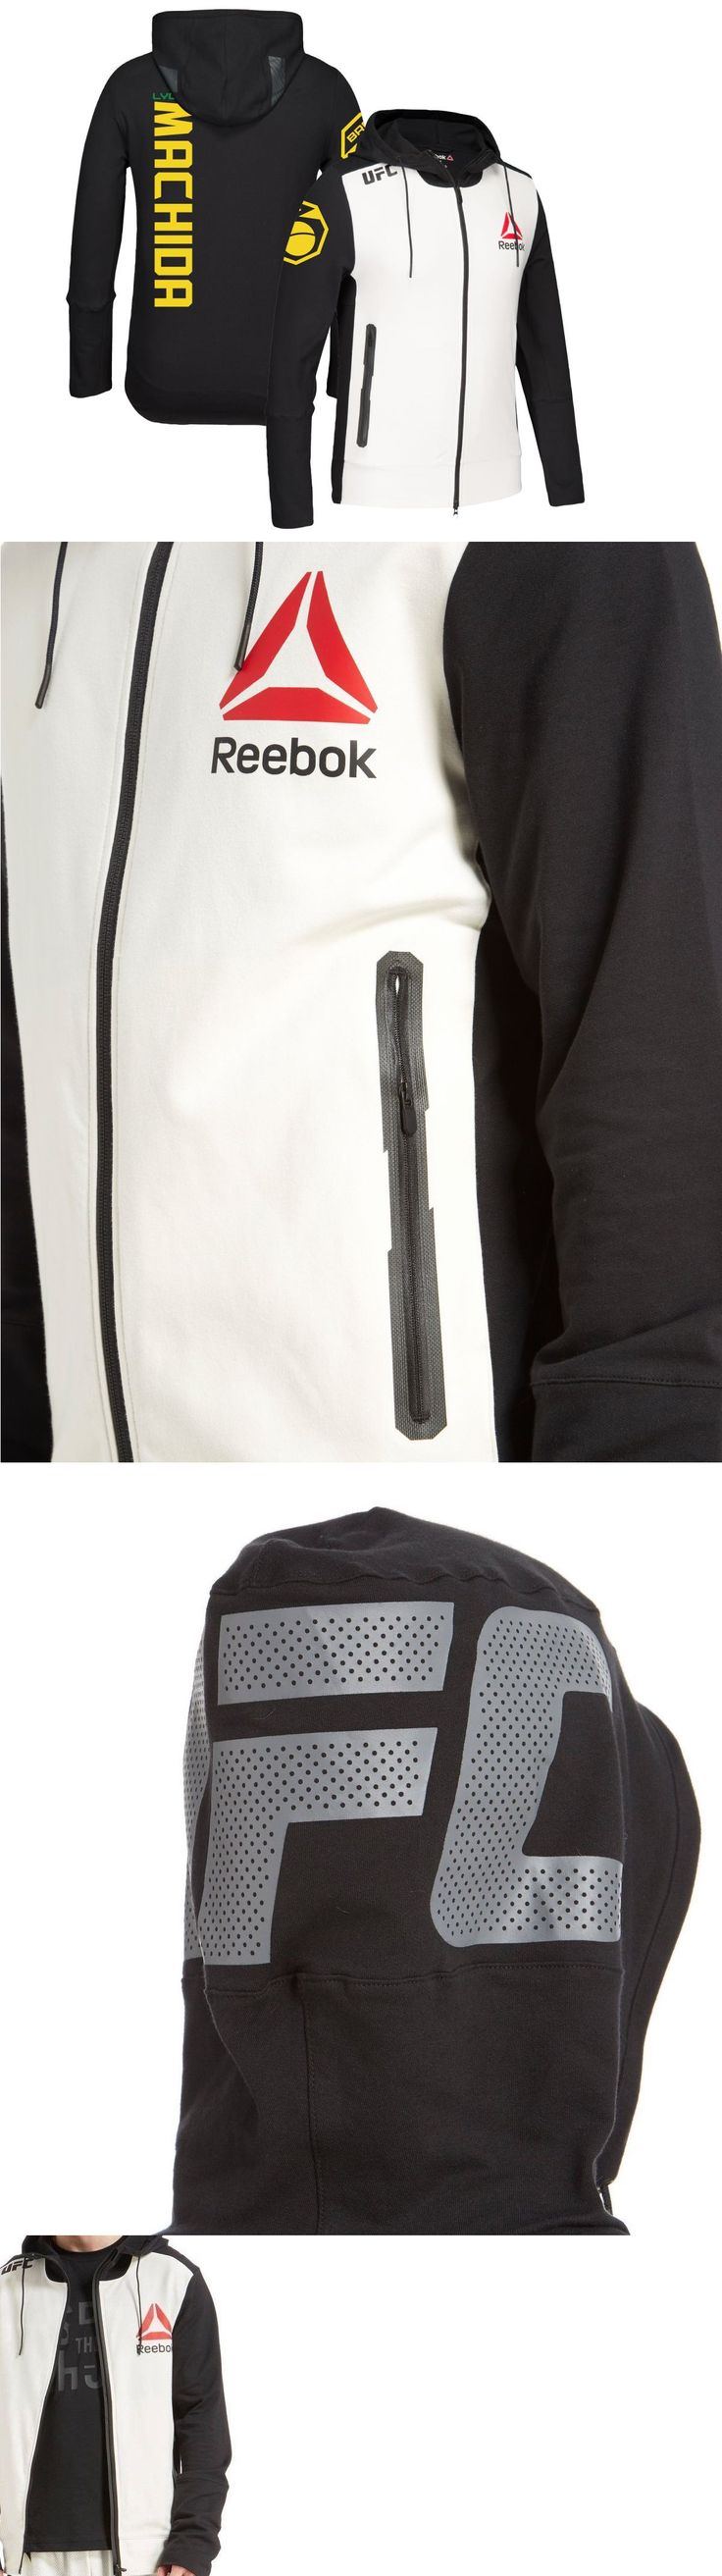 Shorts 73982: $129 Reebok Ufc Full Zip Jacket Machida Brazil Ufc Walkout Hoodie Fighter Kit -> BUY IT NOW ONLY: $65 on eBay!